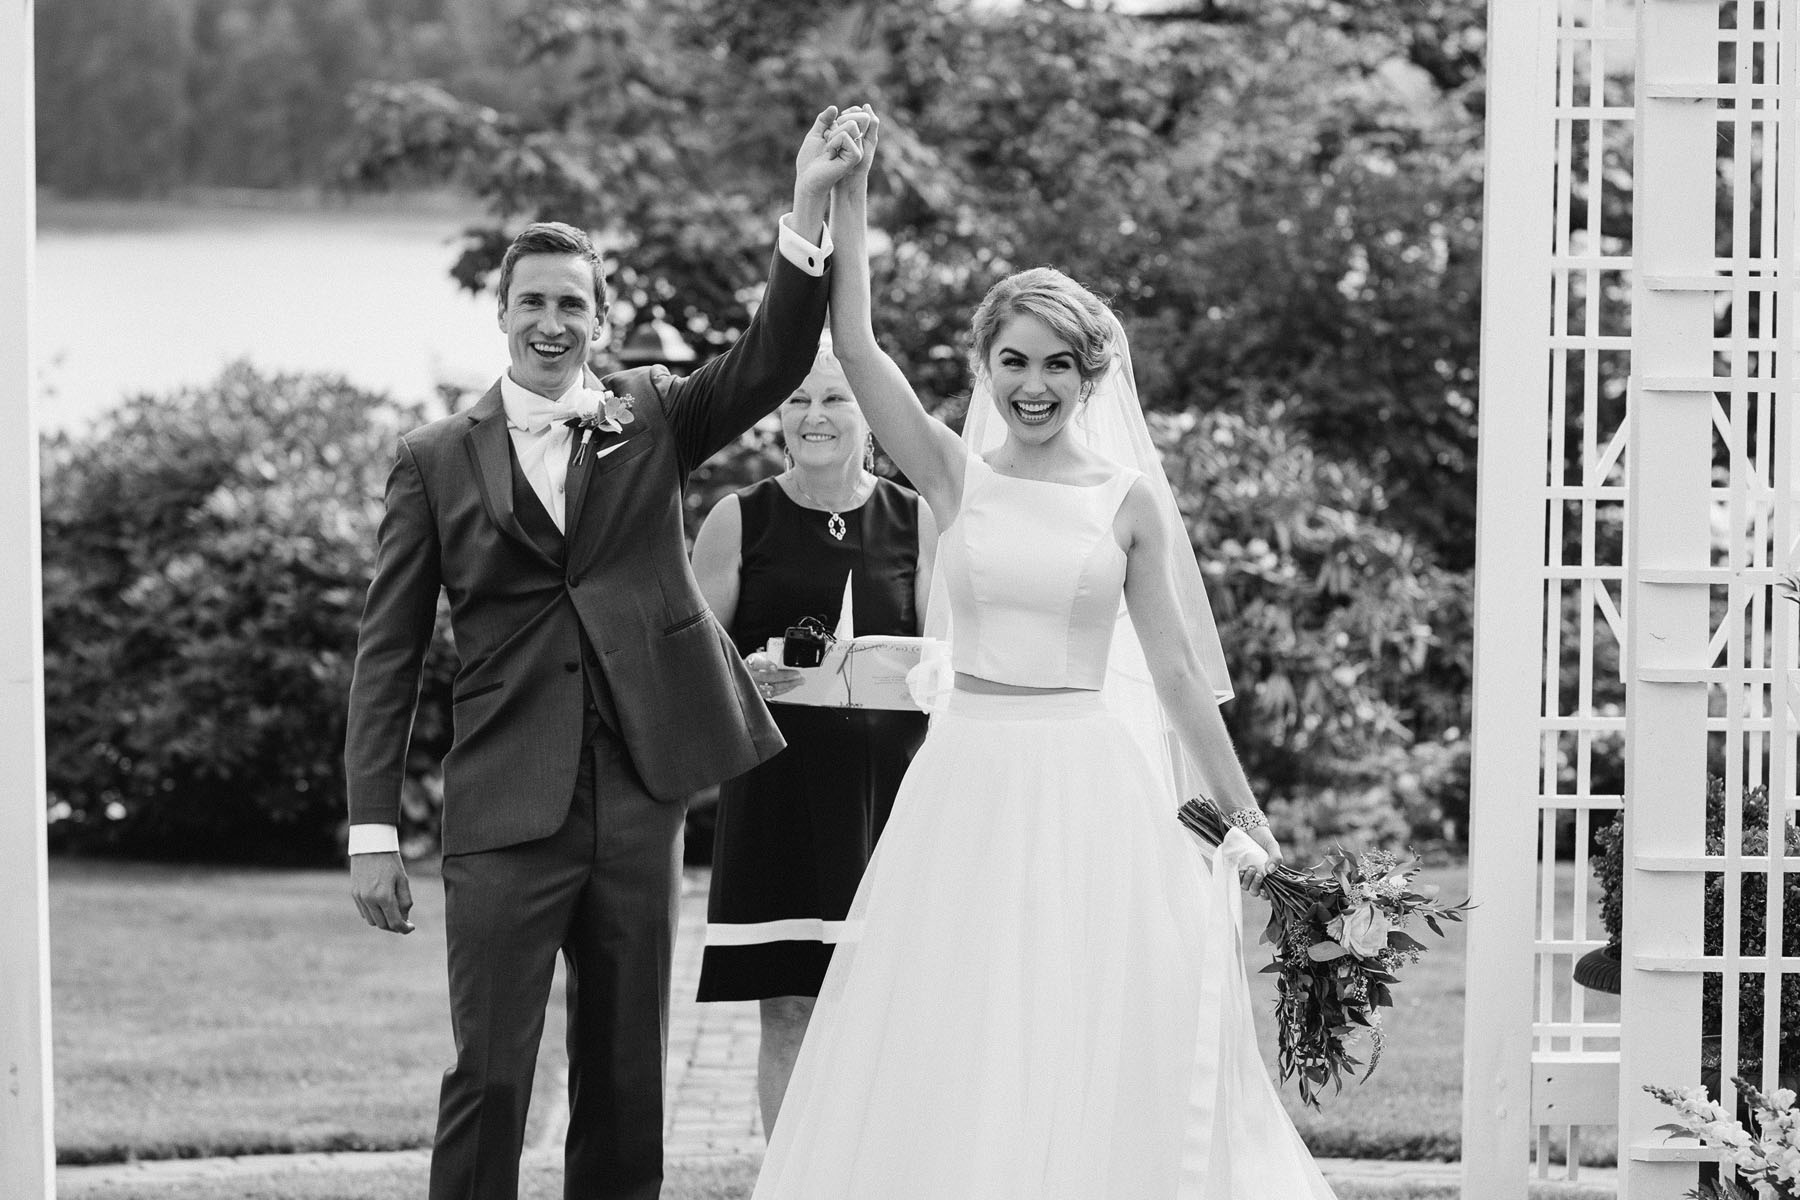 thetis-island-wedding-photographer-rp-rn-100.jpg